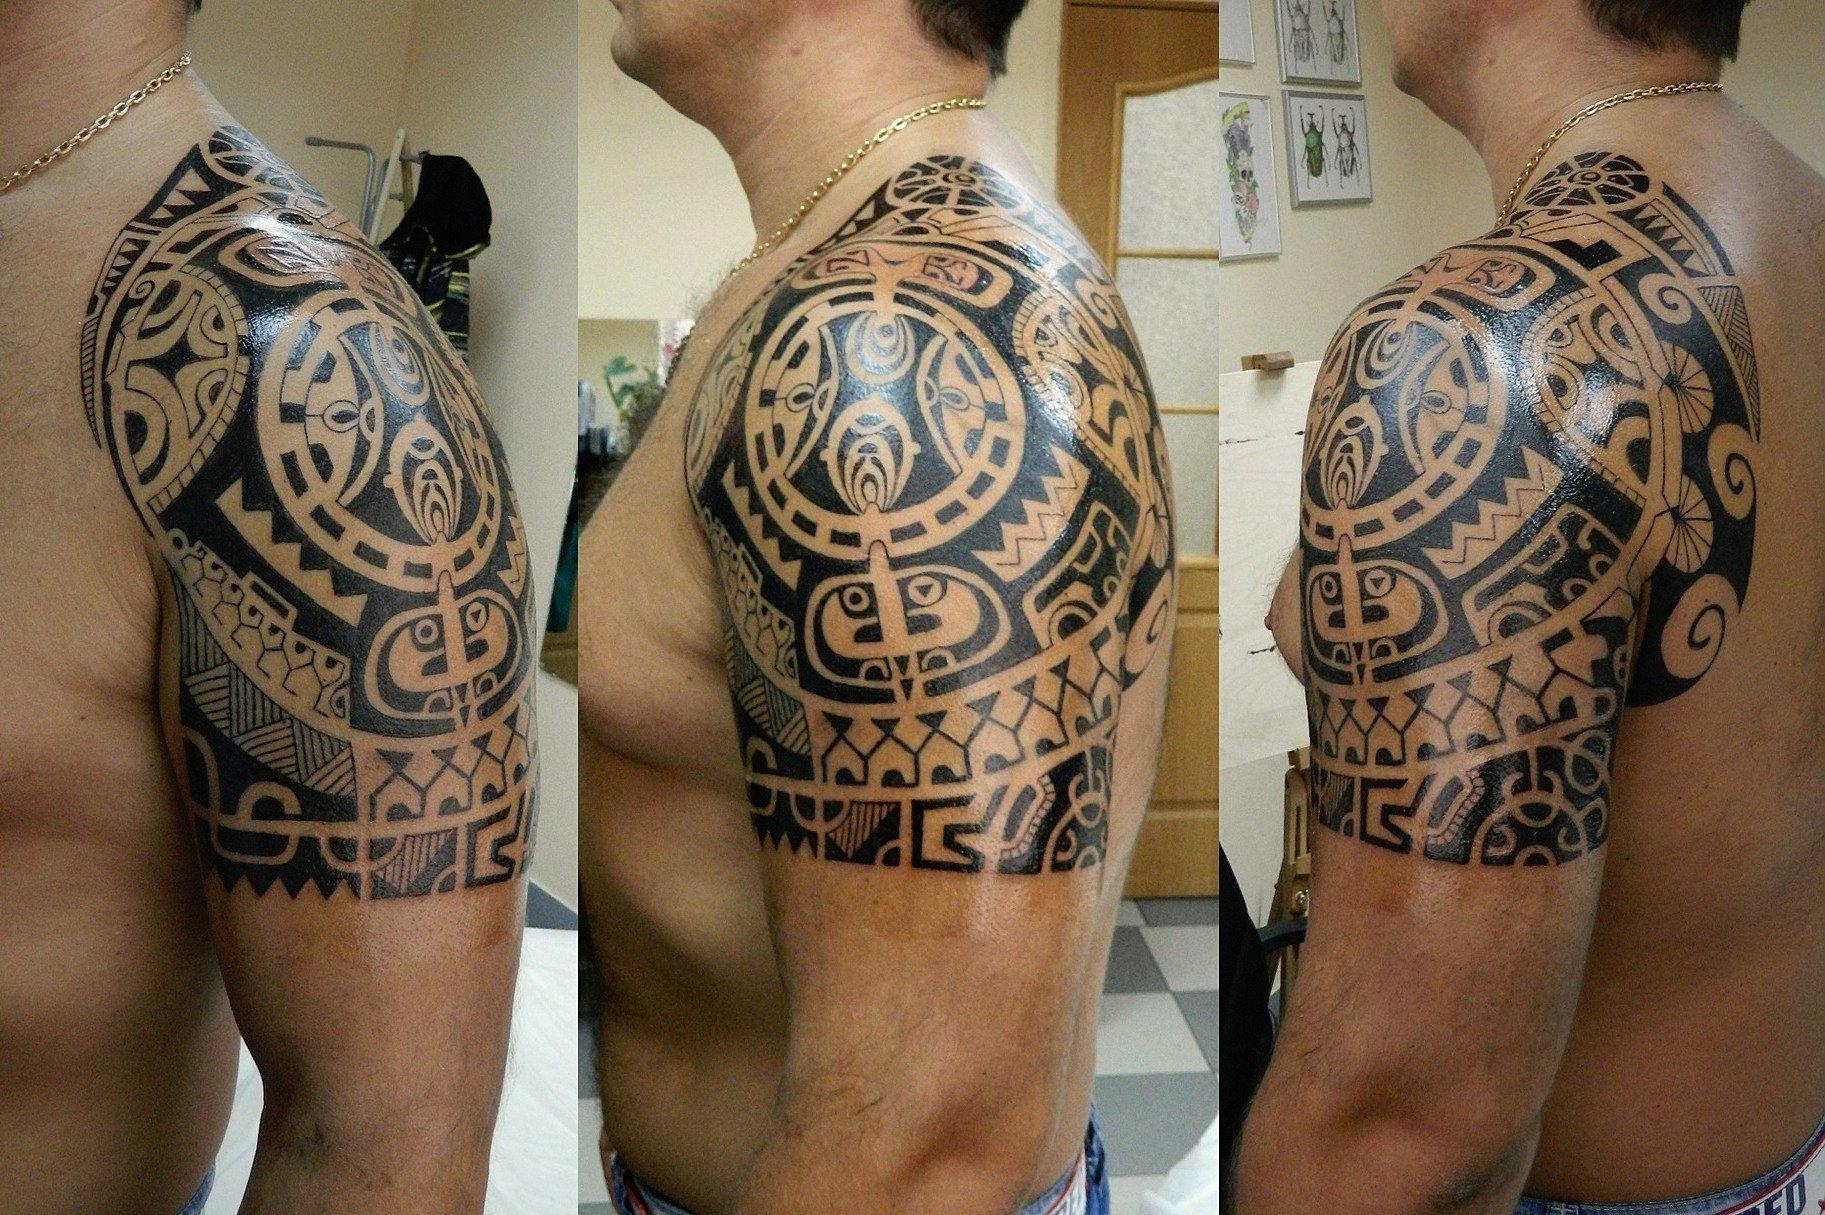 Эскизы тату. Каталог эскизов татуировок